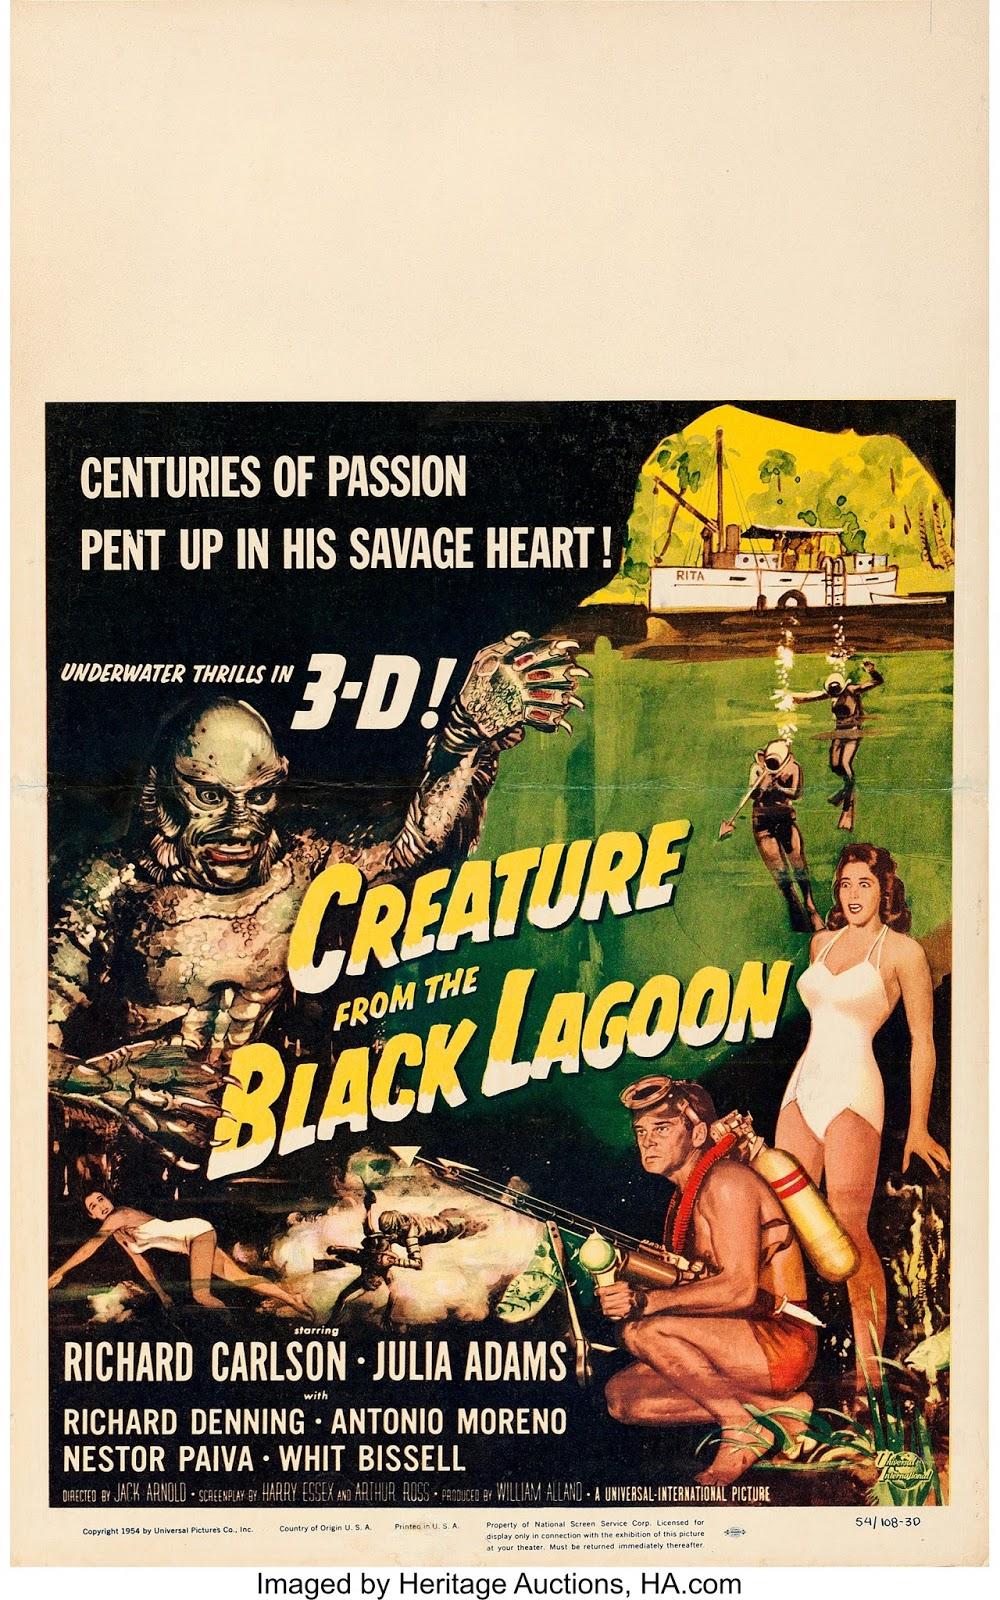 Pop Culture Safari!: Vintage movie poster: